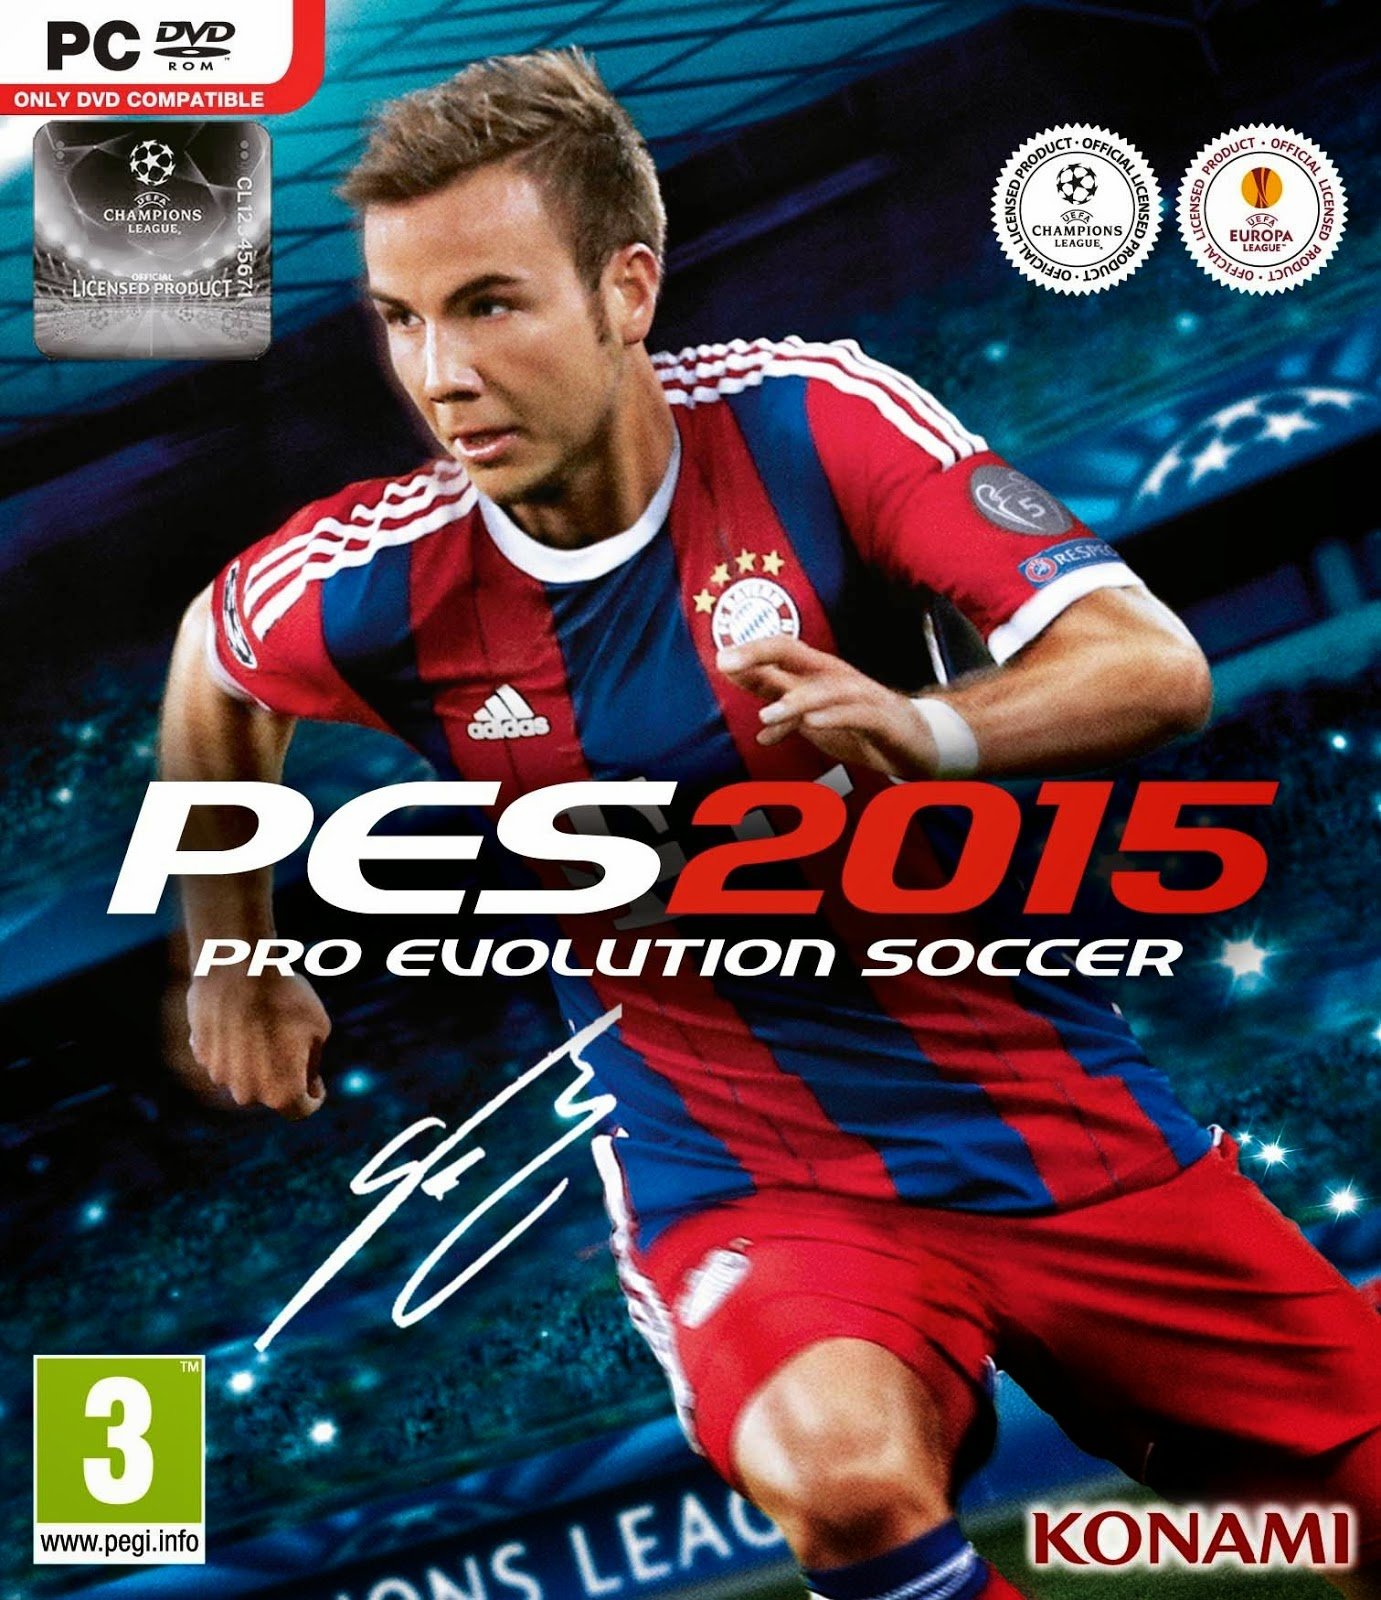 Pro evolution soccer 2015 key generator cd key serial free.